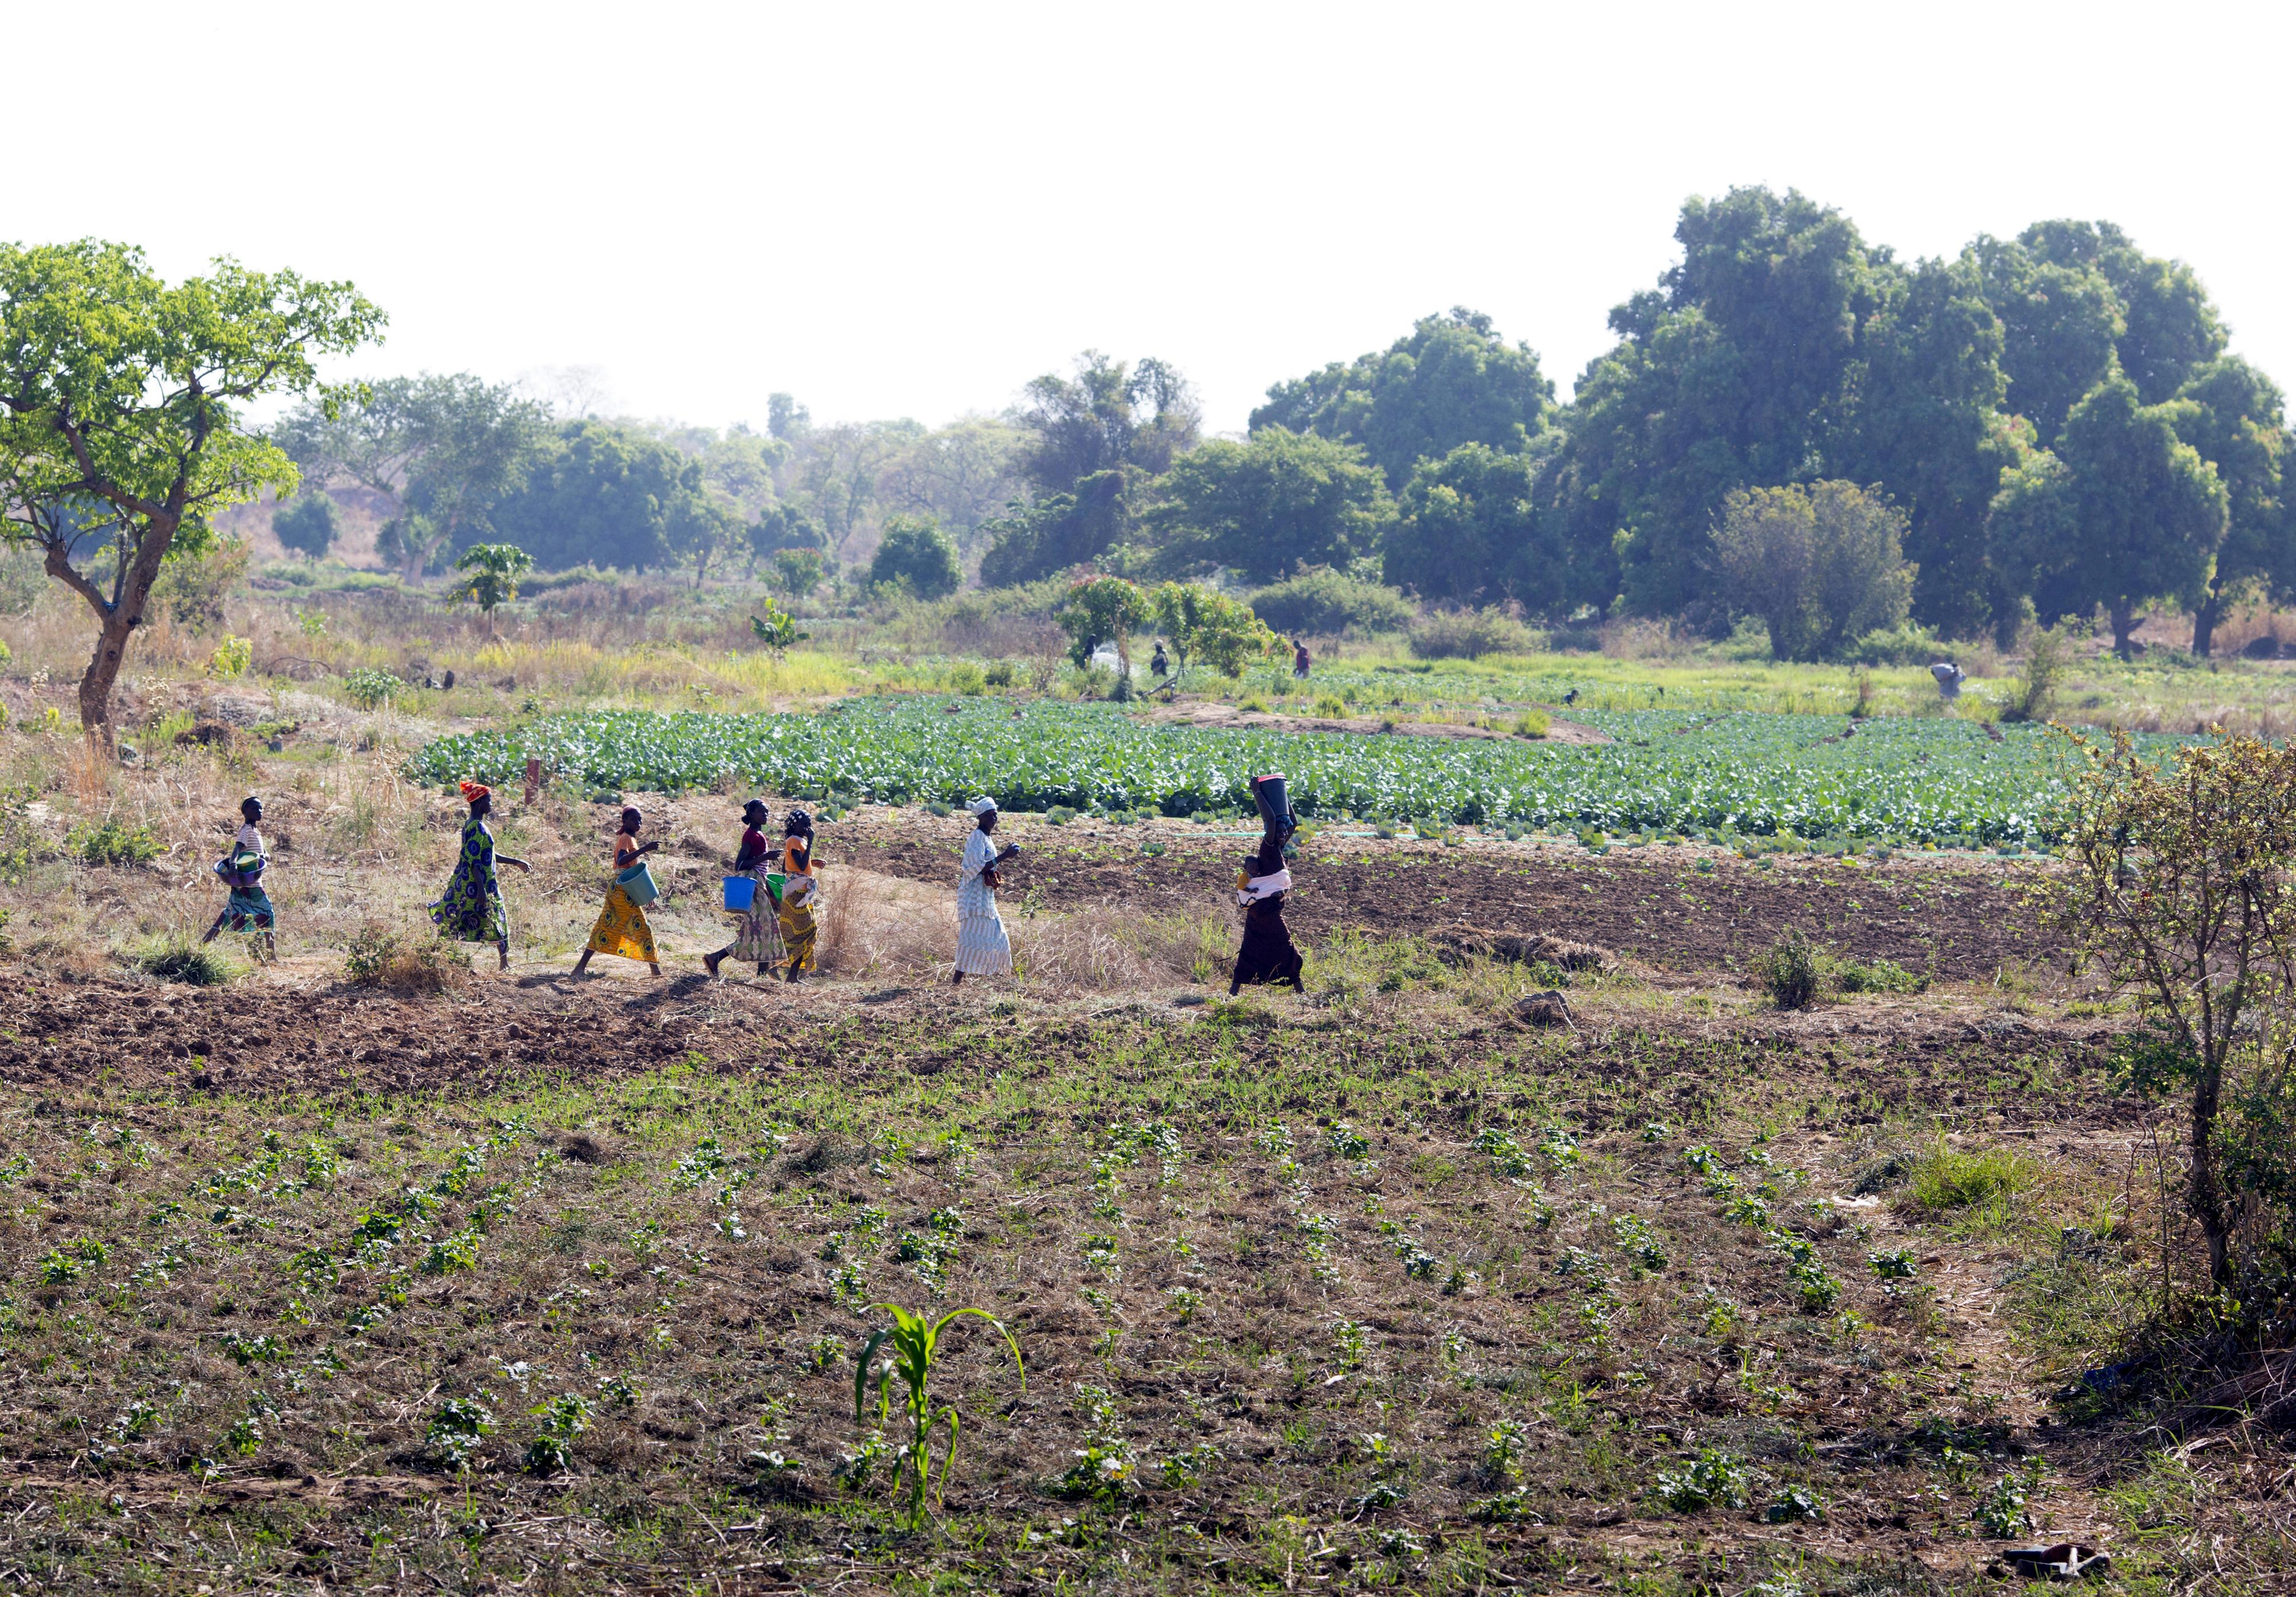 Bäuerinnen auf dem Weg zum Feld in Beledougou in Mali